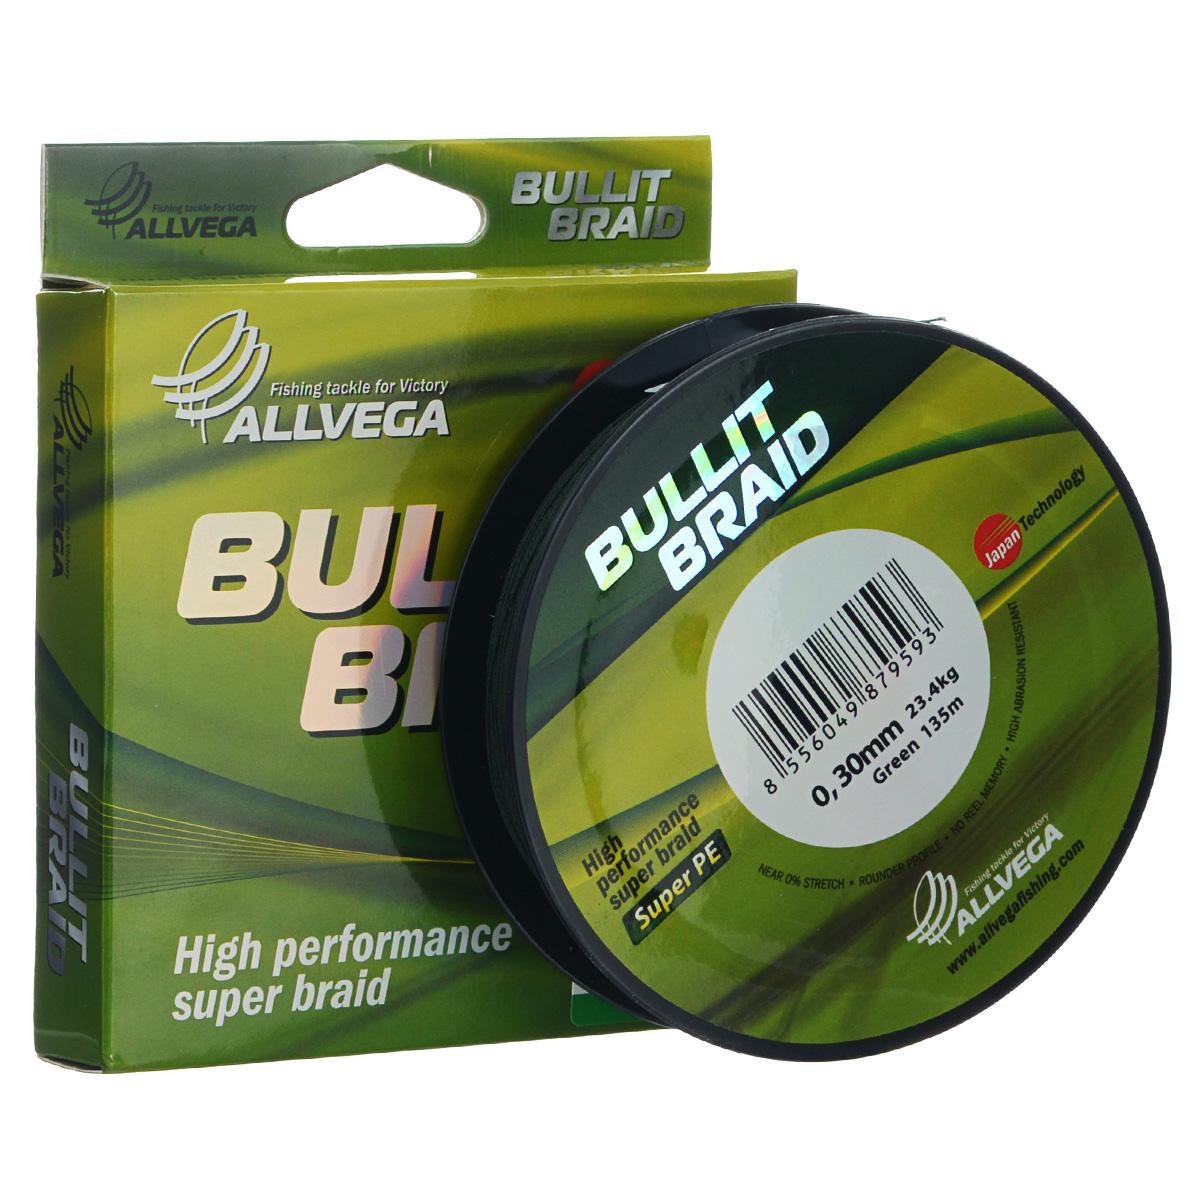 Леска плетеная Allvega Bullit Braid, цвет: темно-зеленый, 135 м, 0,3 мм, 23,4 кг леска плетеная power pro цвет желтый 135 м 0 23 мм 15 кг